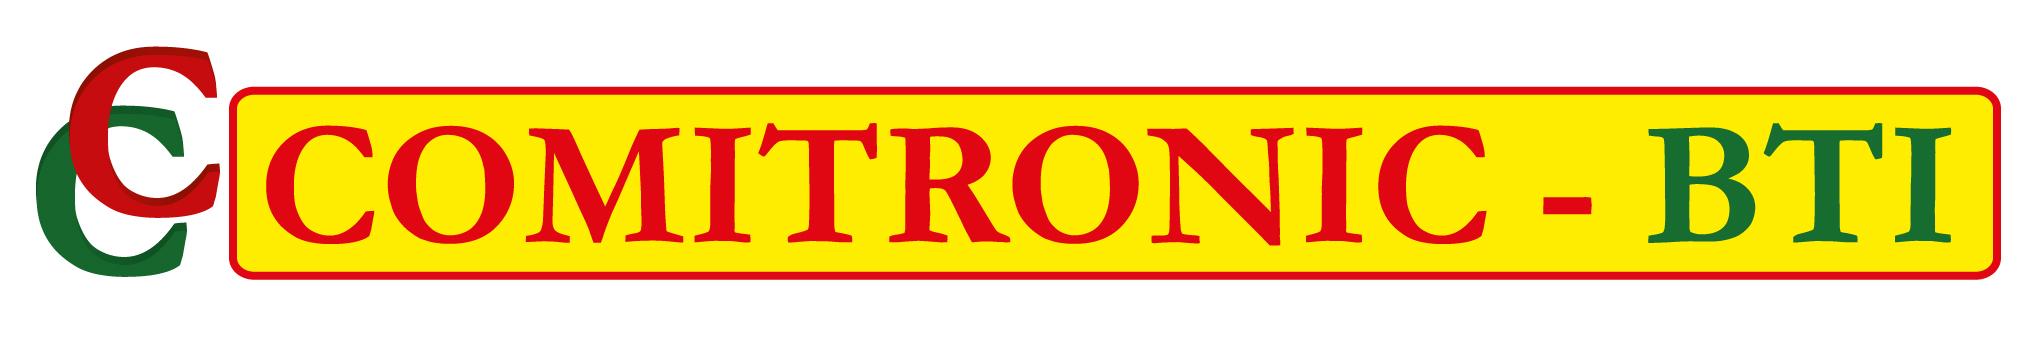 Comitronic-BTI Logo